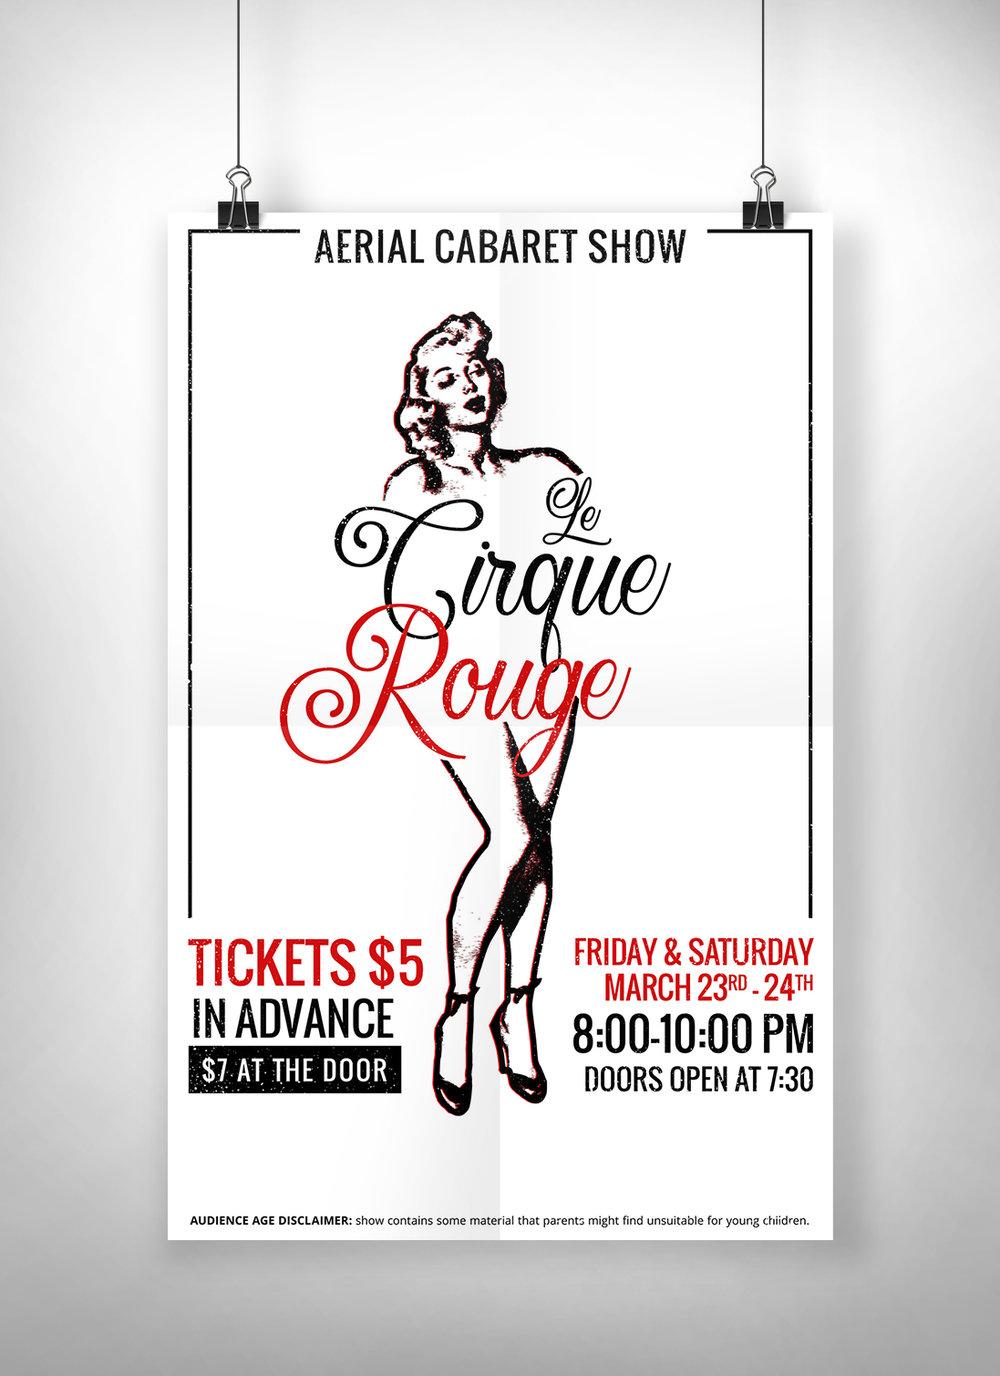 Le-Cirque-Rouge-Poster-Mockup.jpg